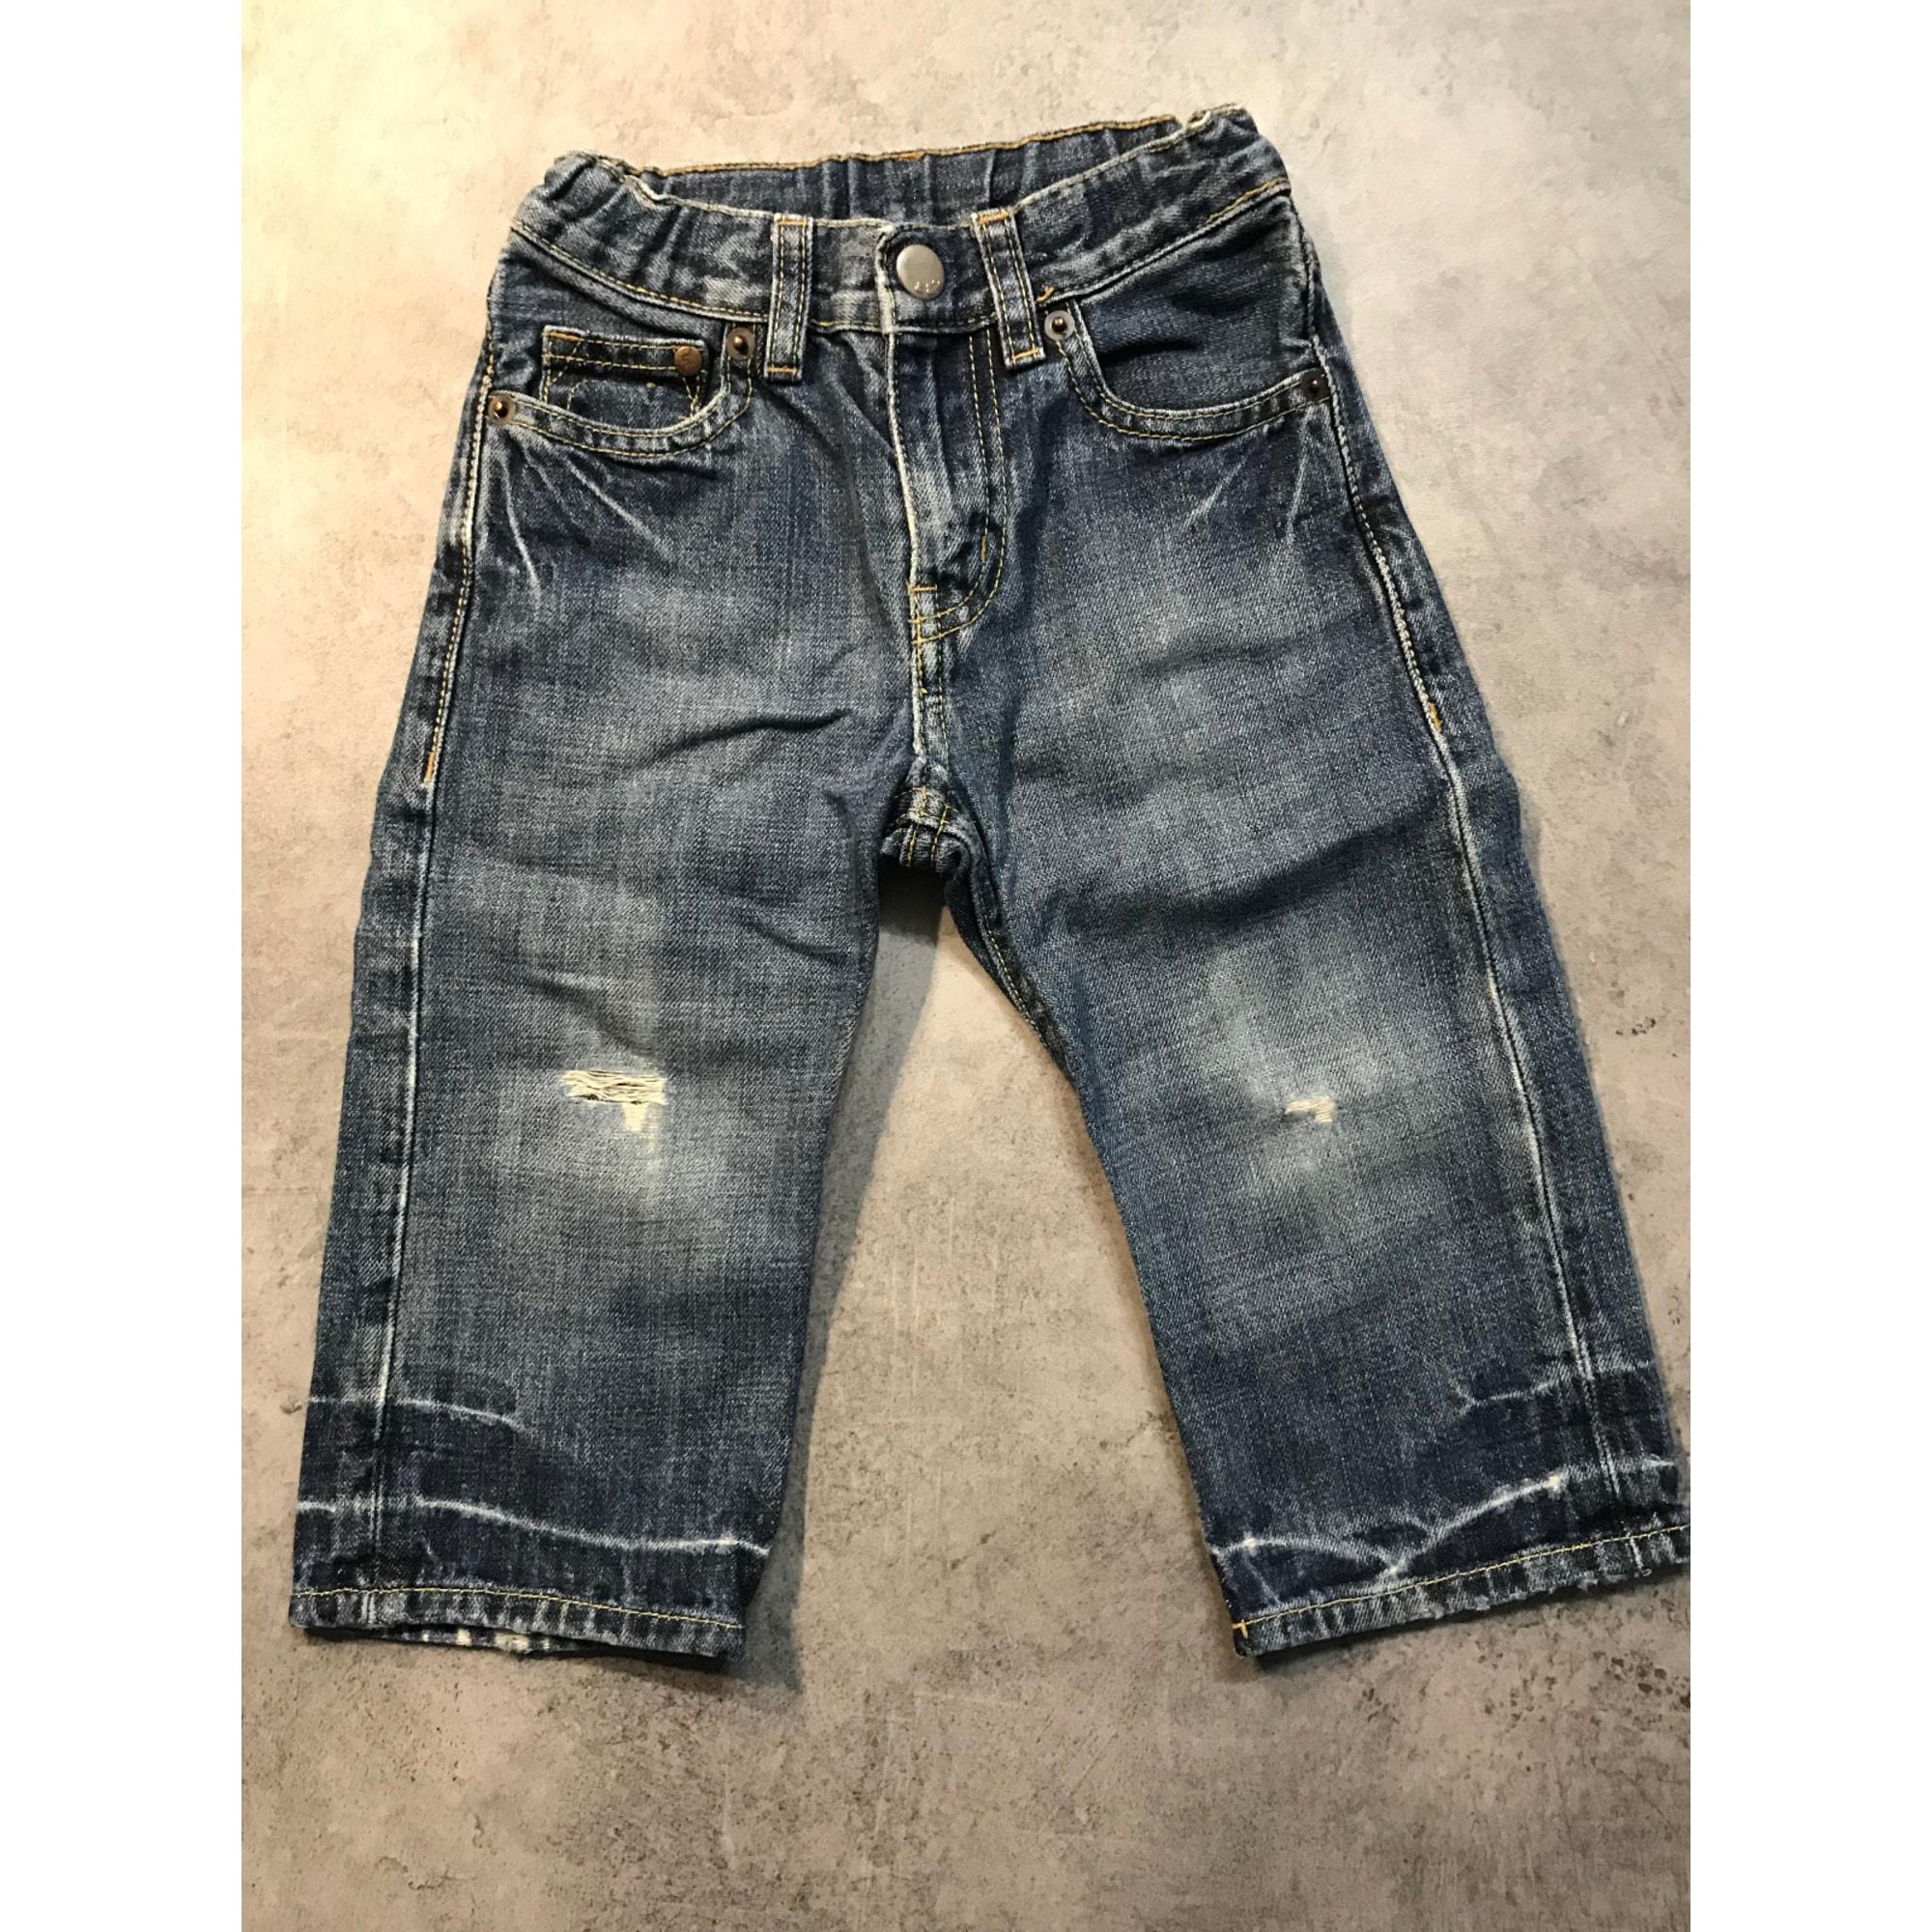 Bermuda Shorts H&M Blue, navy, turquoise